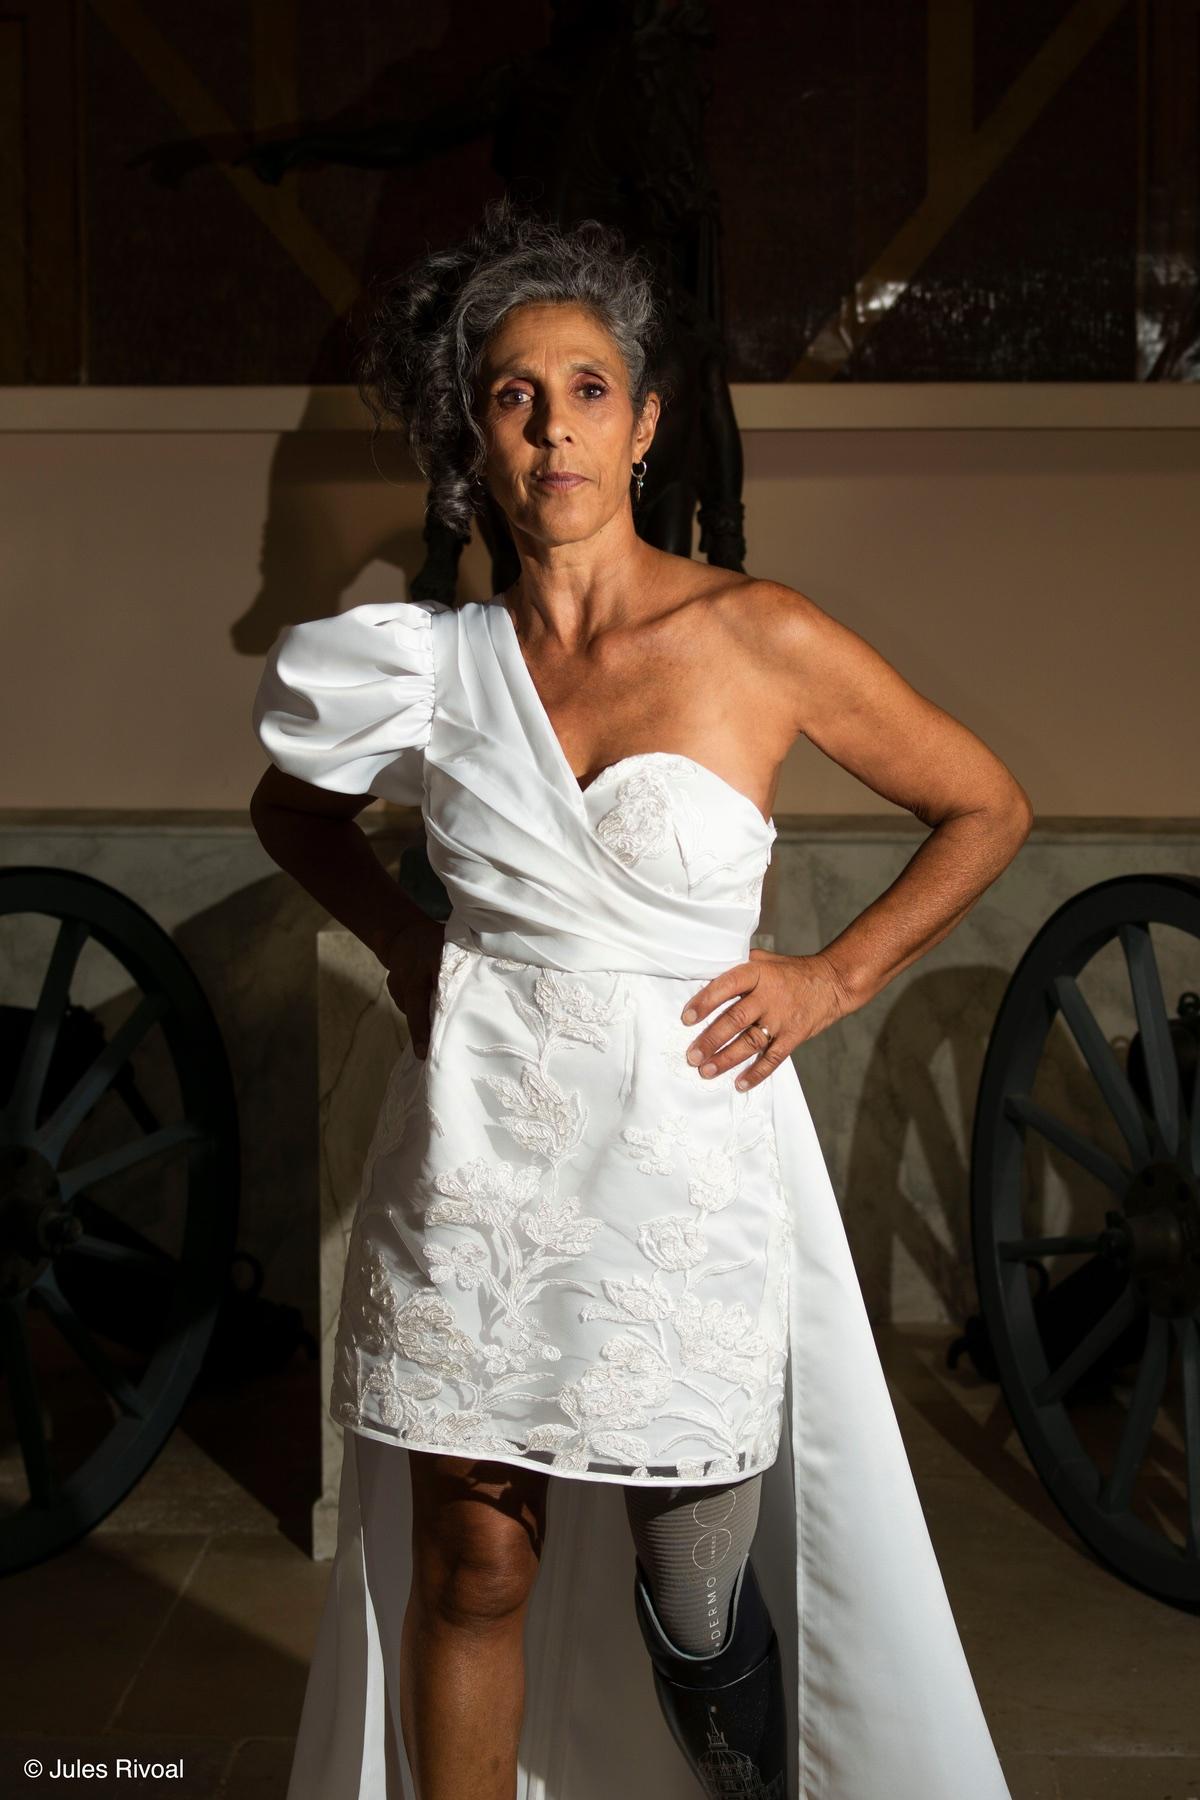 Fabienne pose en robe blanche, sa prothèse visible.